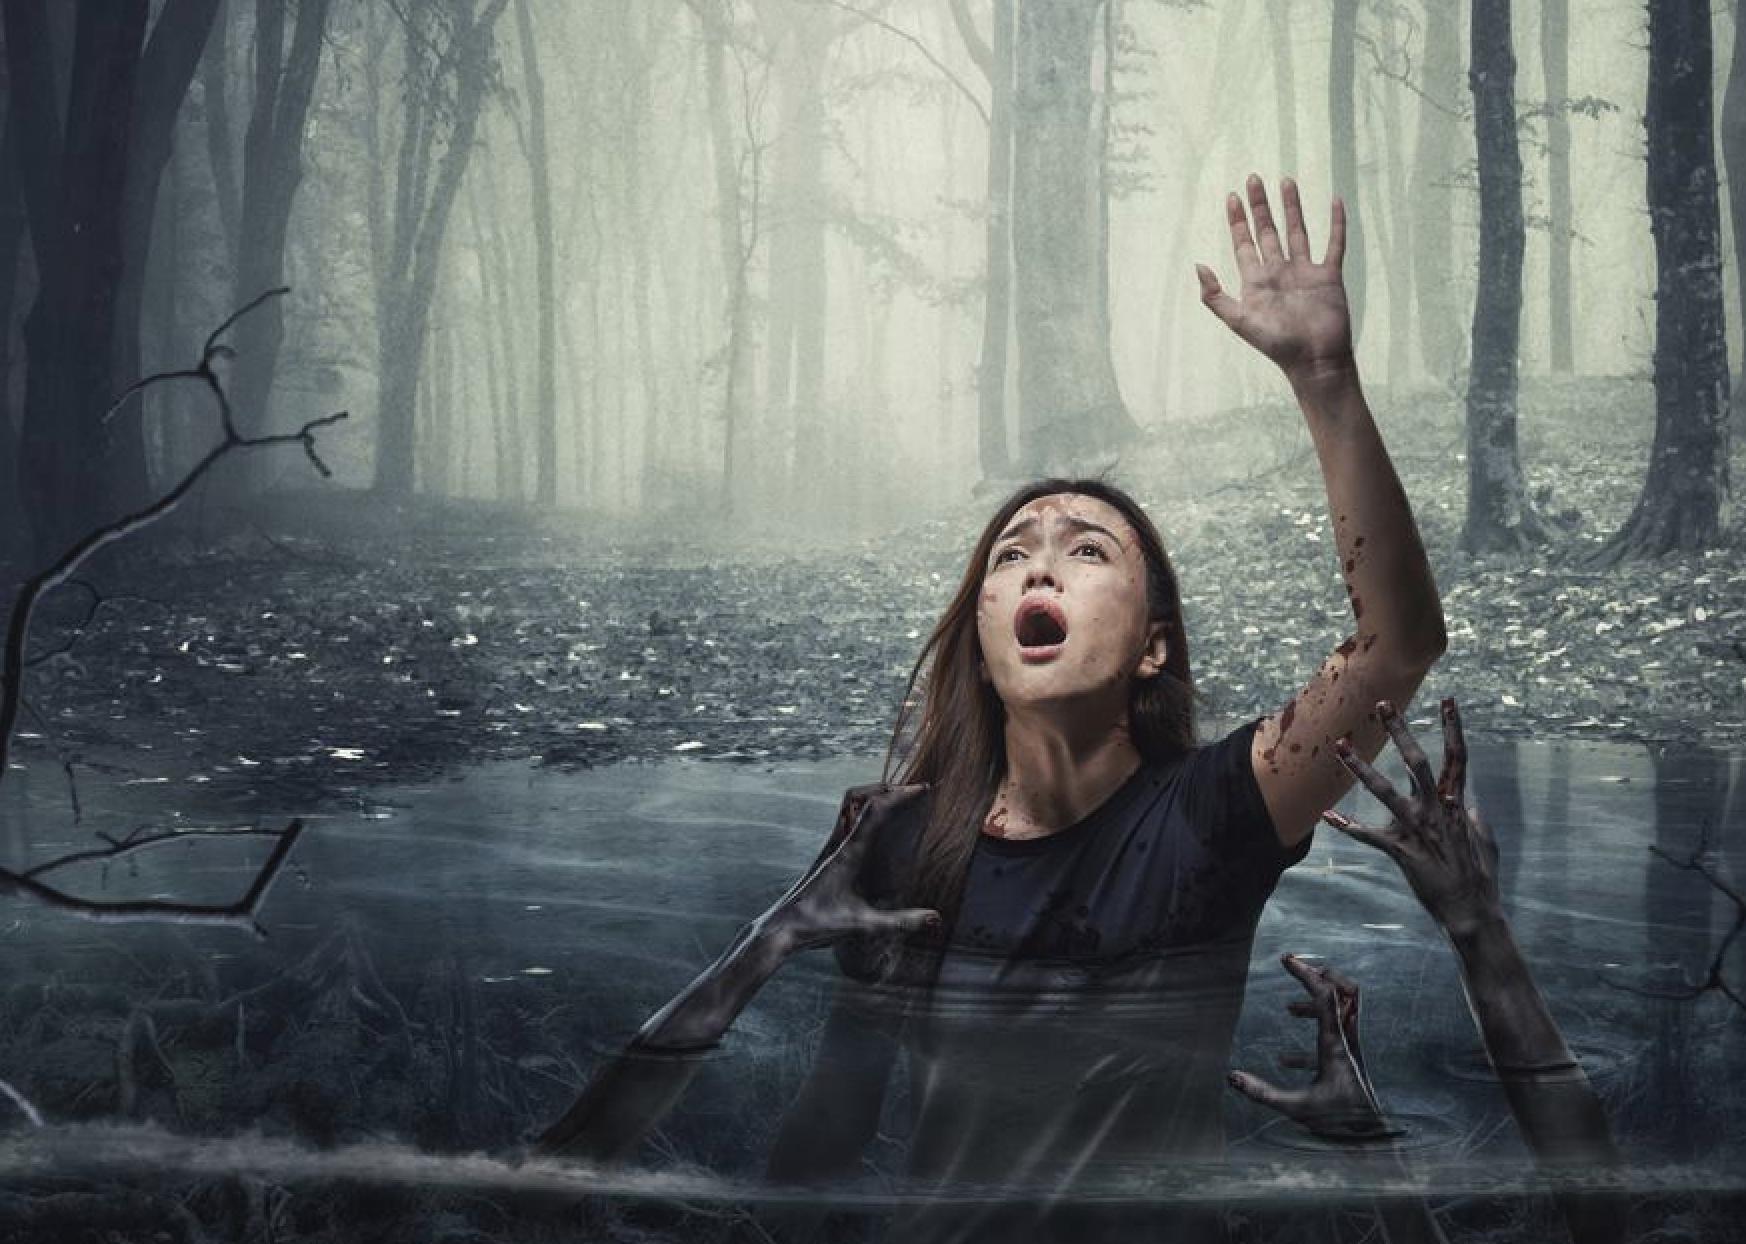 Rasuk-2018-Indonesian-horror-movie-film-3-Shandy-Auliamrhorrorpedia